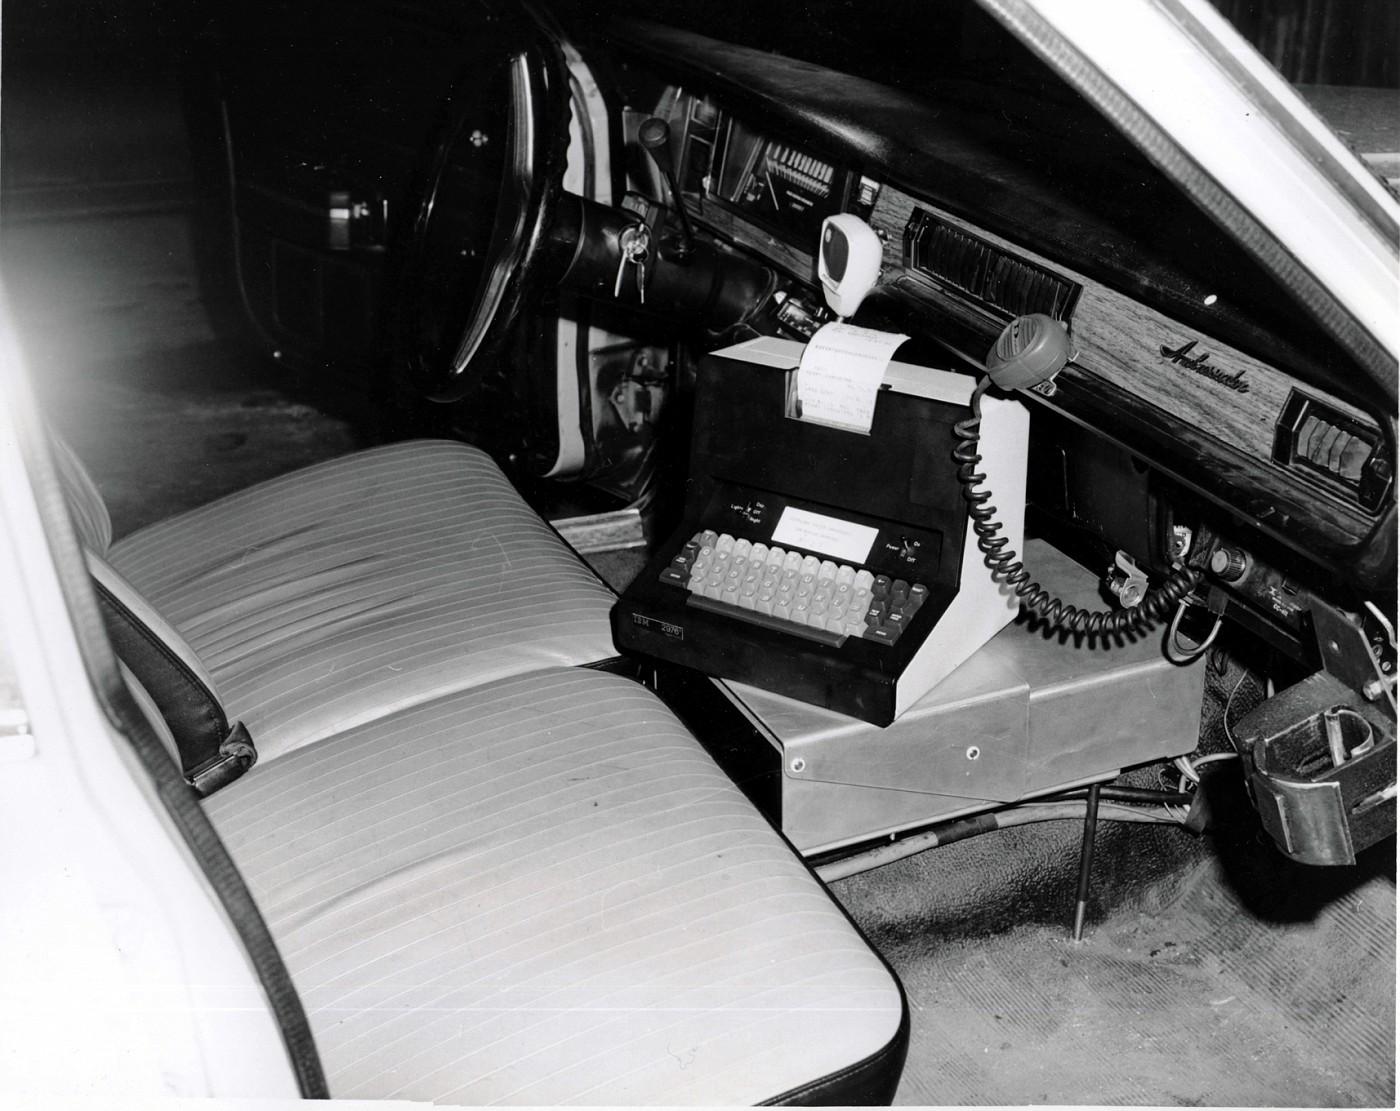 Полицаи. ( 70 фото ) 1988008009cpm-vi.jpg